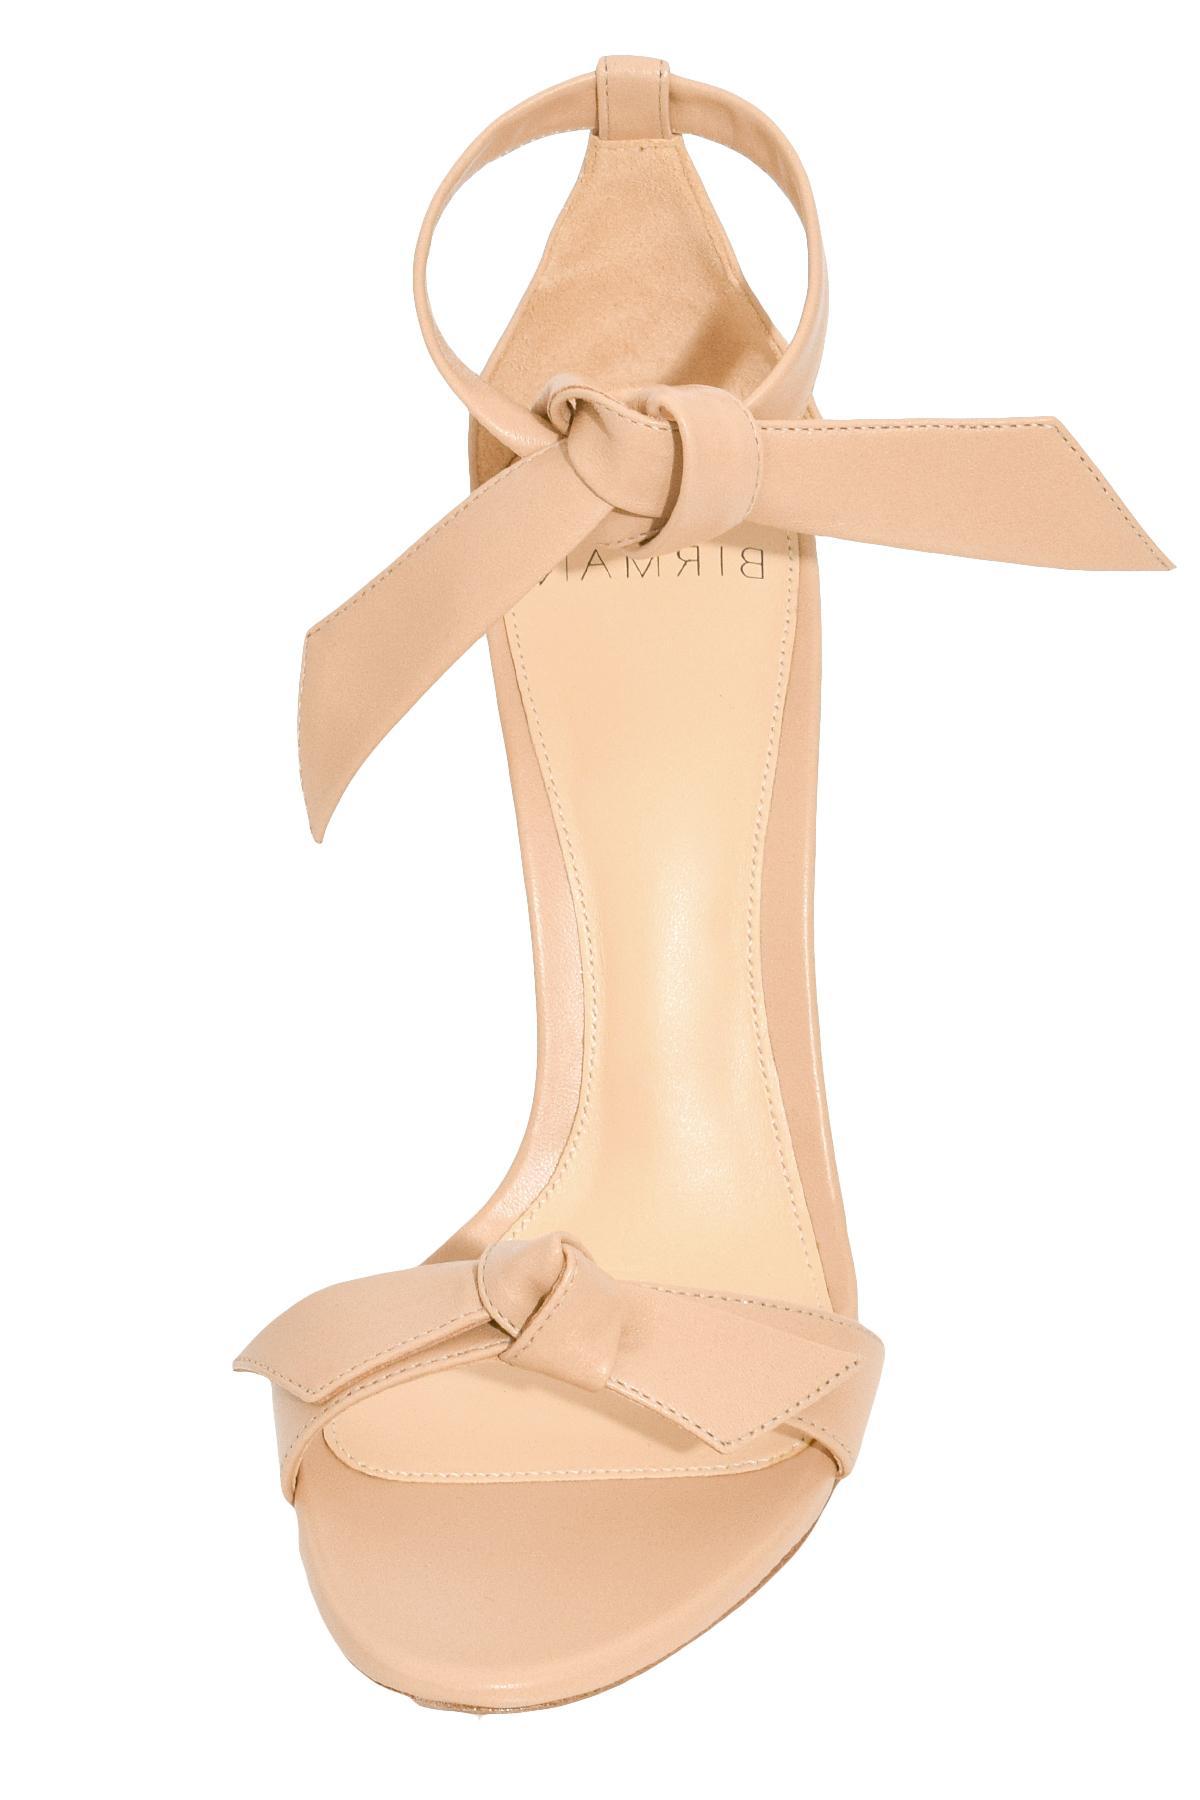 394a8bd5f5d6 Alexandre Birman - Natural Clarita Block Heel In Nude - Lyst. View  fullscreen